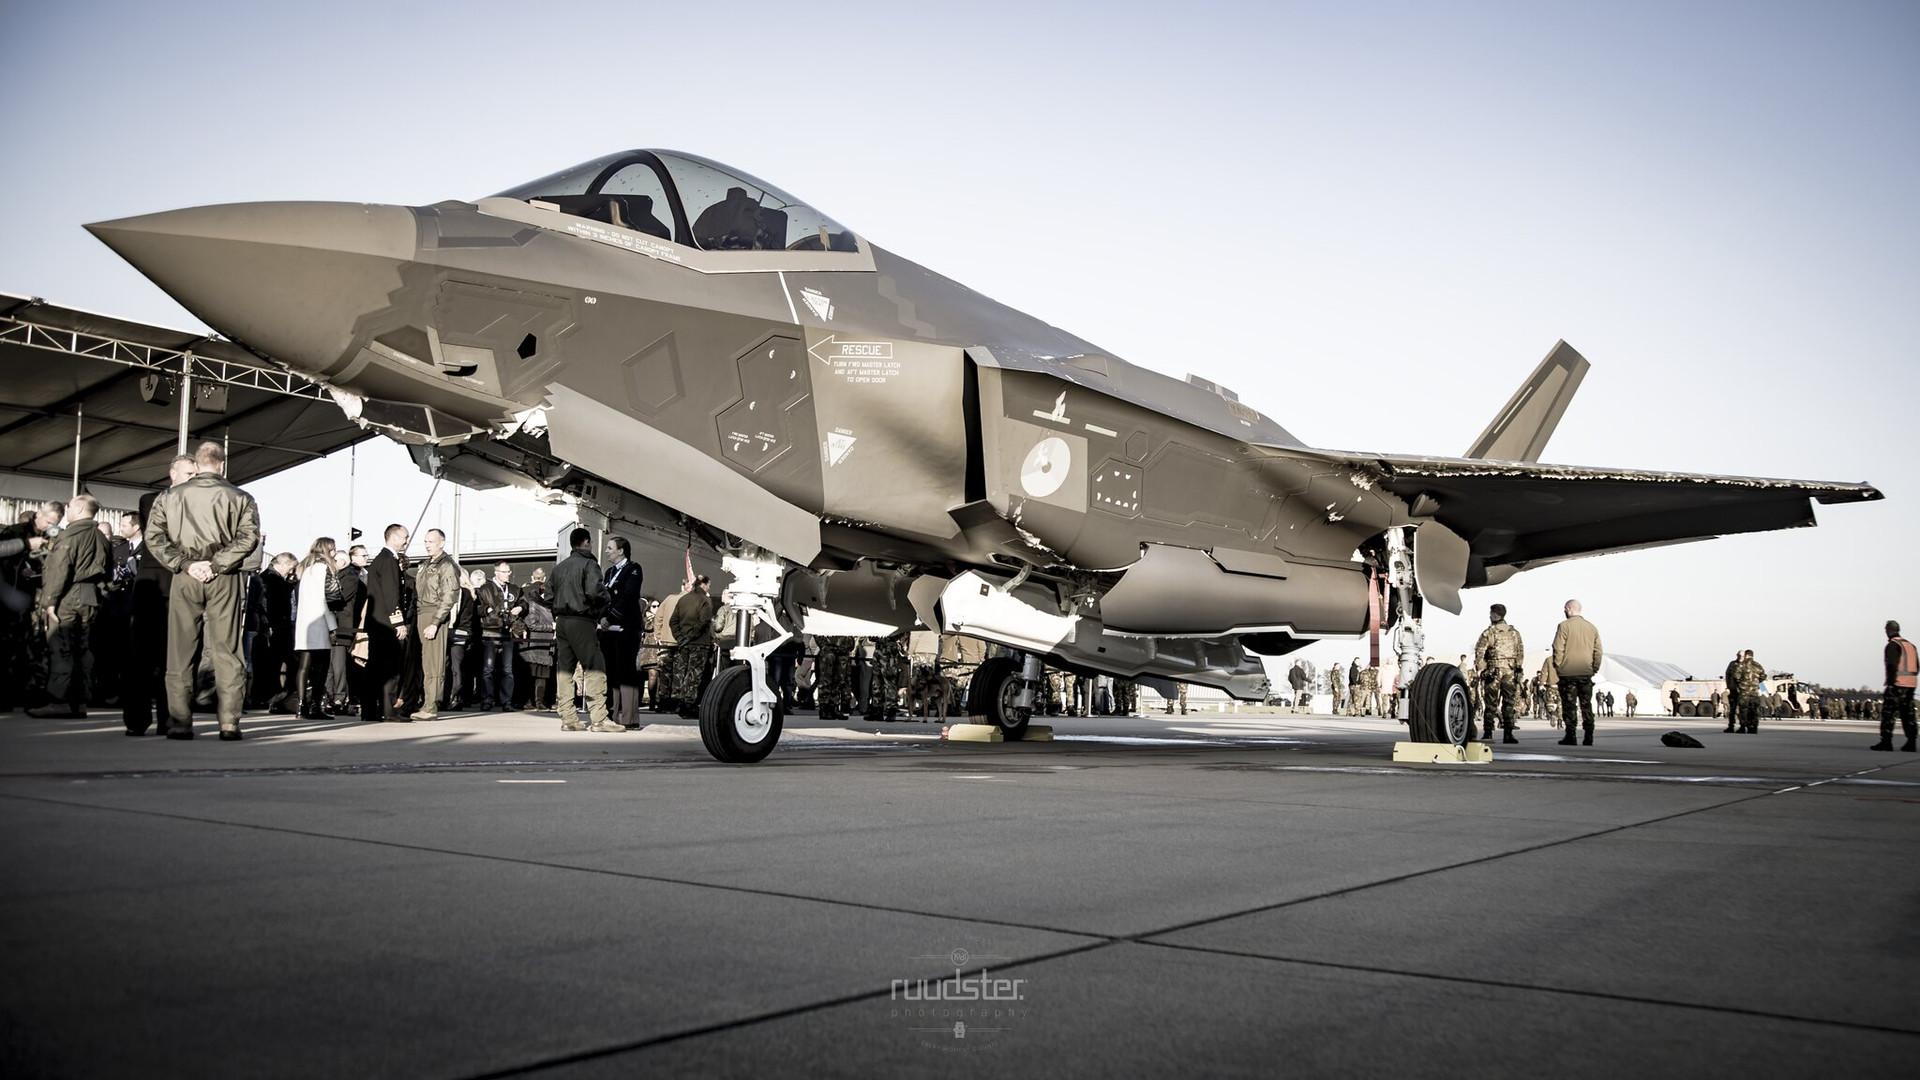 F-009   Build: 2019 - Lockheed Martin F35 Lightning II